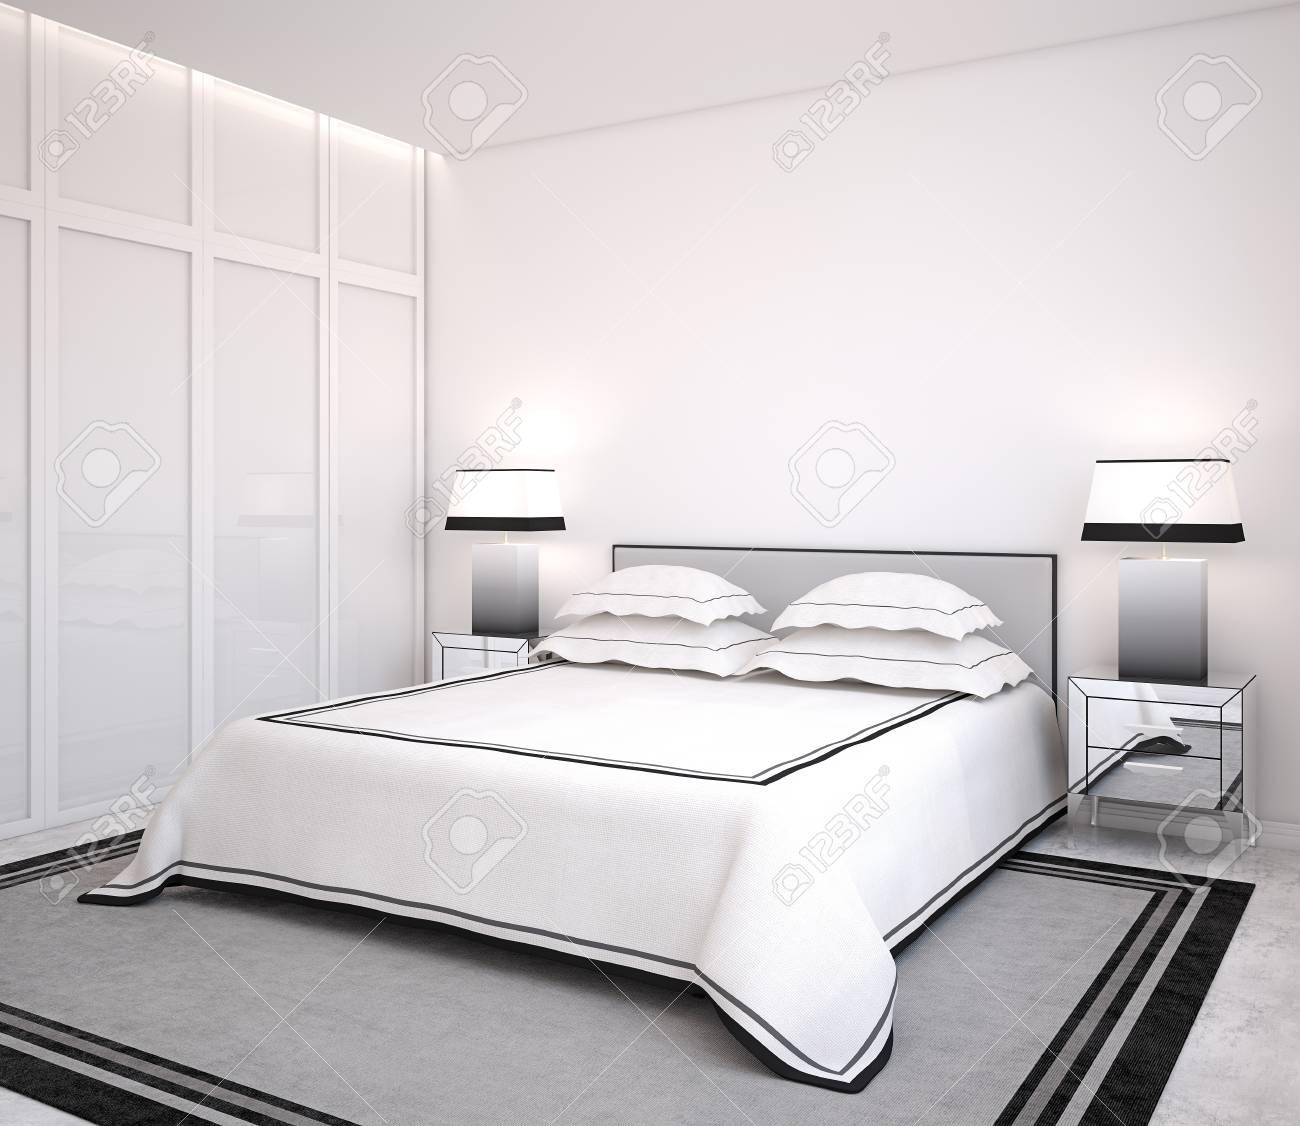 modern bedroom interior 3d render stock photo 43148532